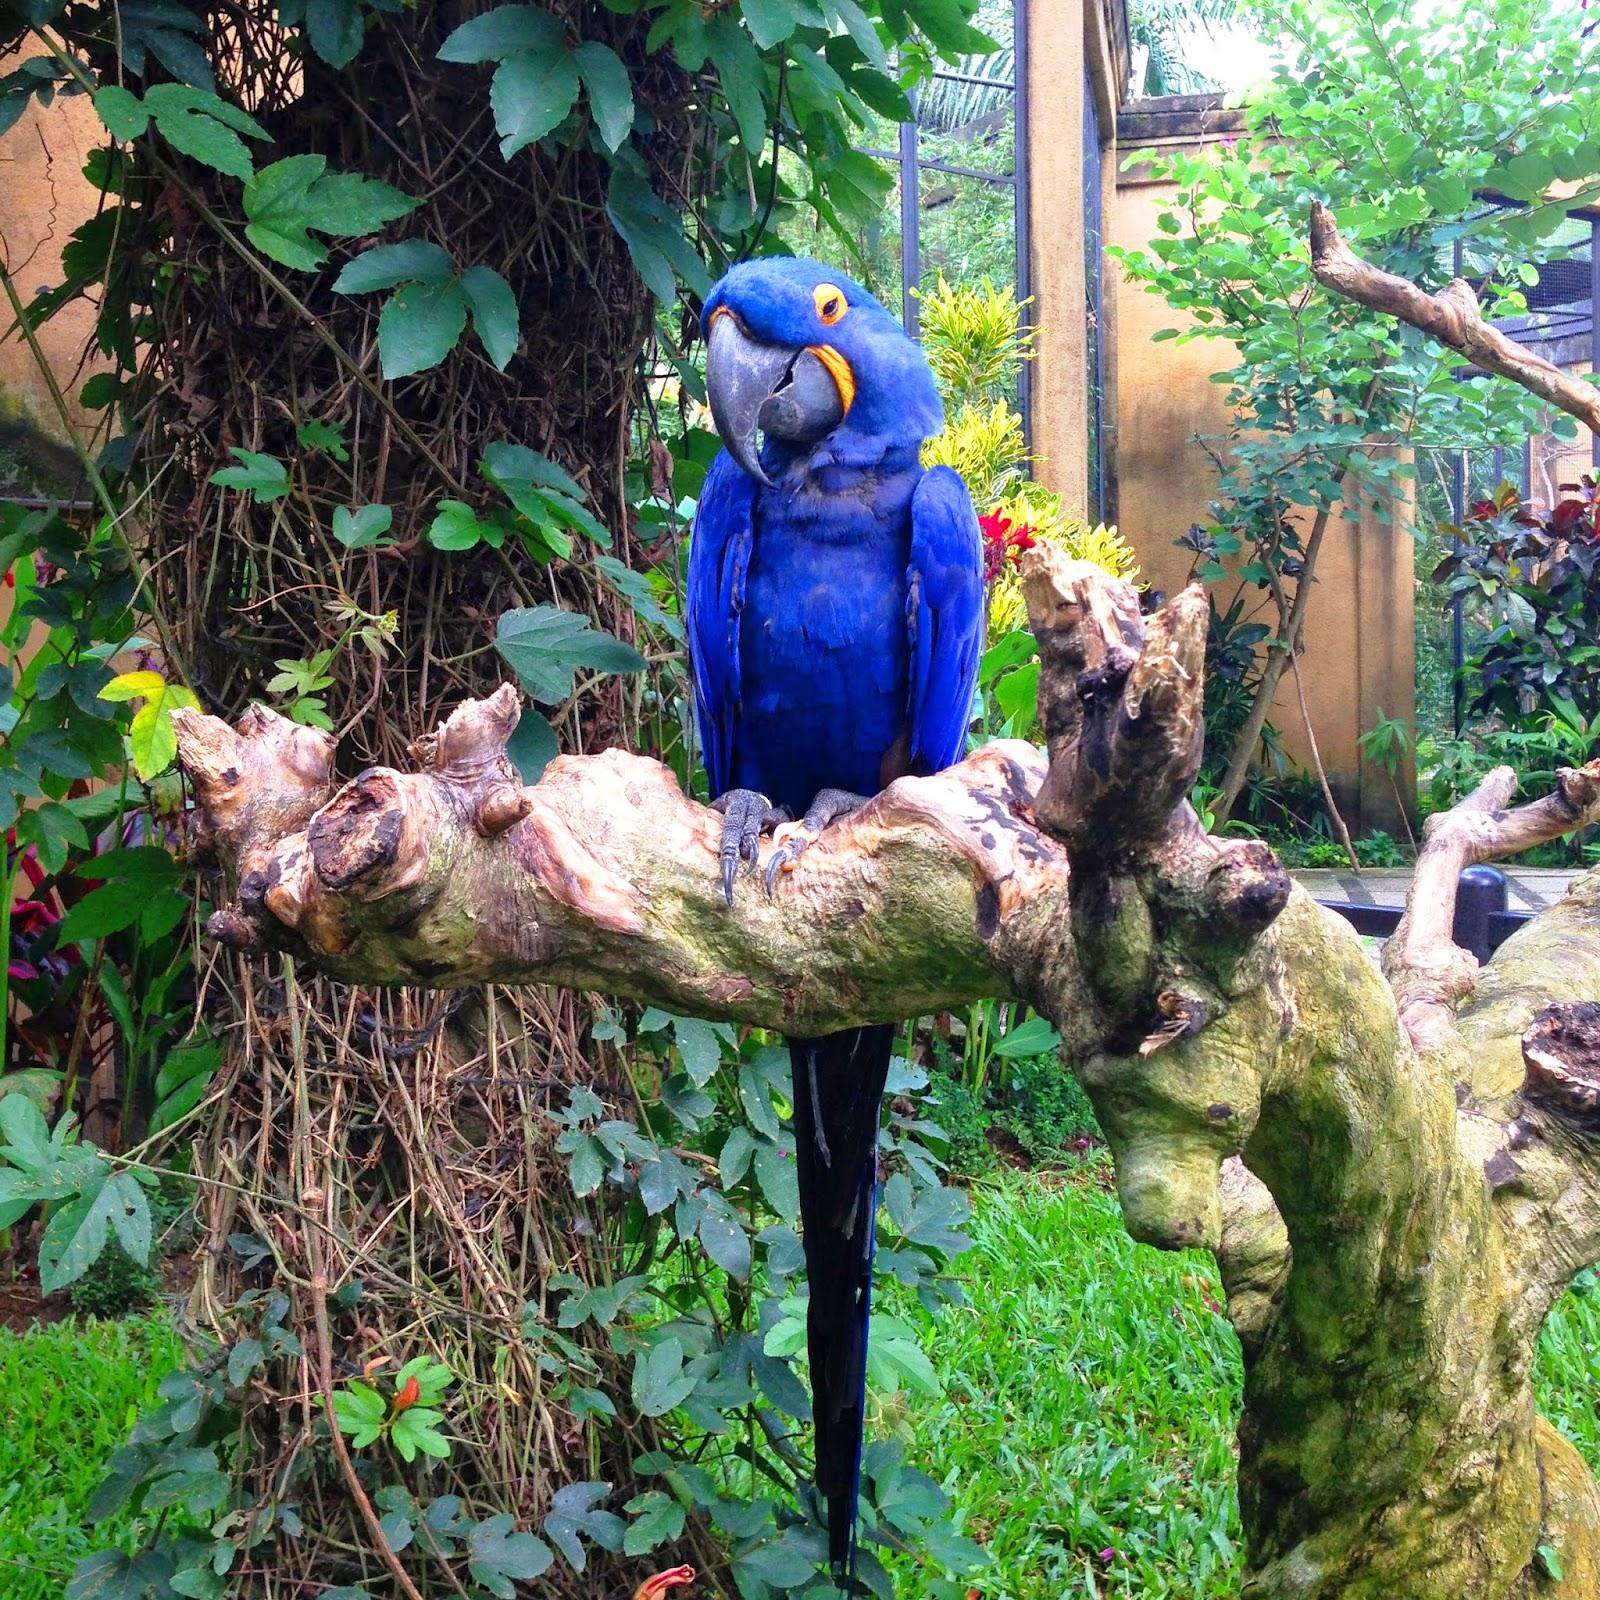 Promo Harga Voucher Tiket Masuk Anak Wisata Bali Bird Park Terbaru Calandiva Premium Front Back Samsung Galaxy A6 2018 56 Inch Tg Biru Bantall Living My Dream At Is Divided Into